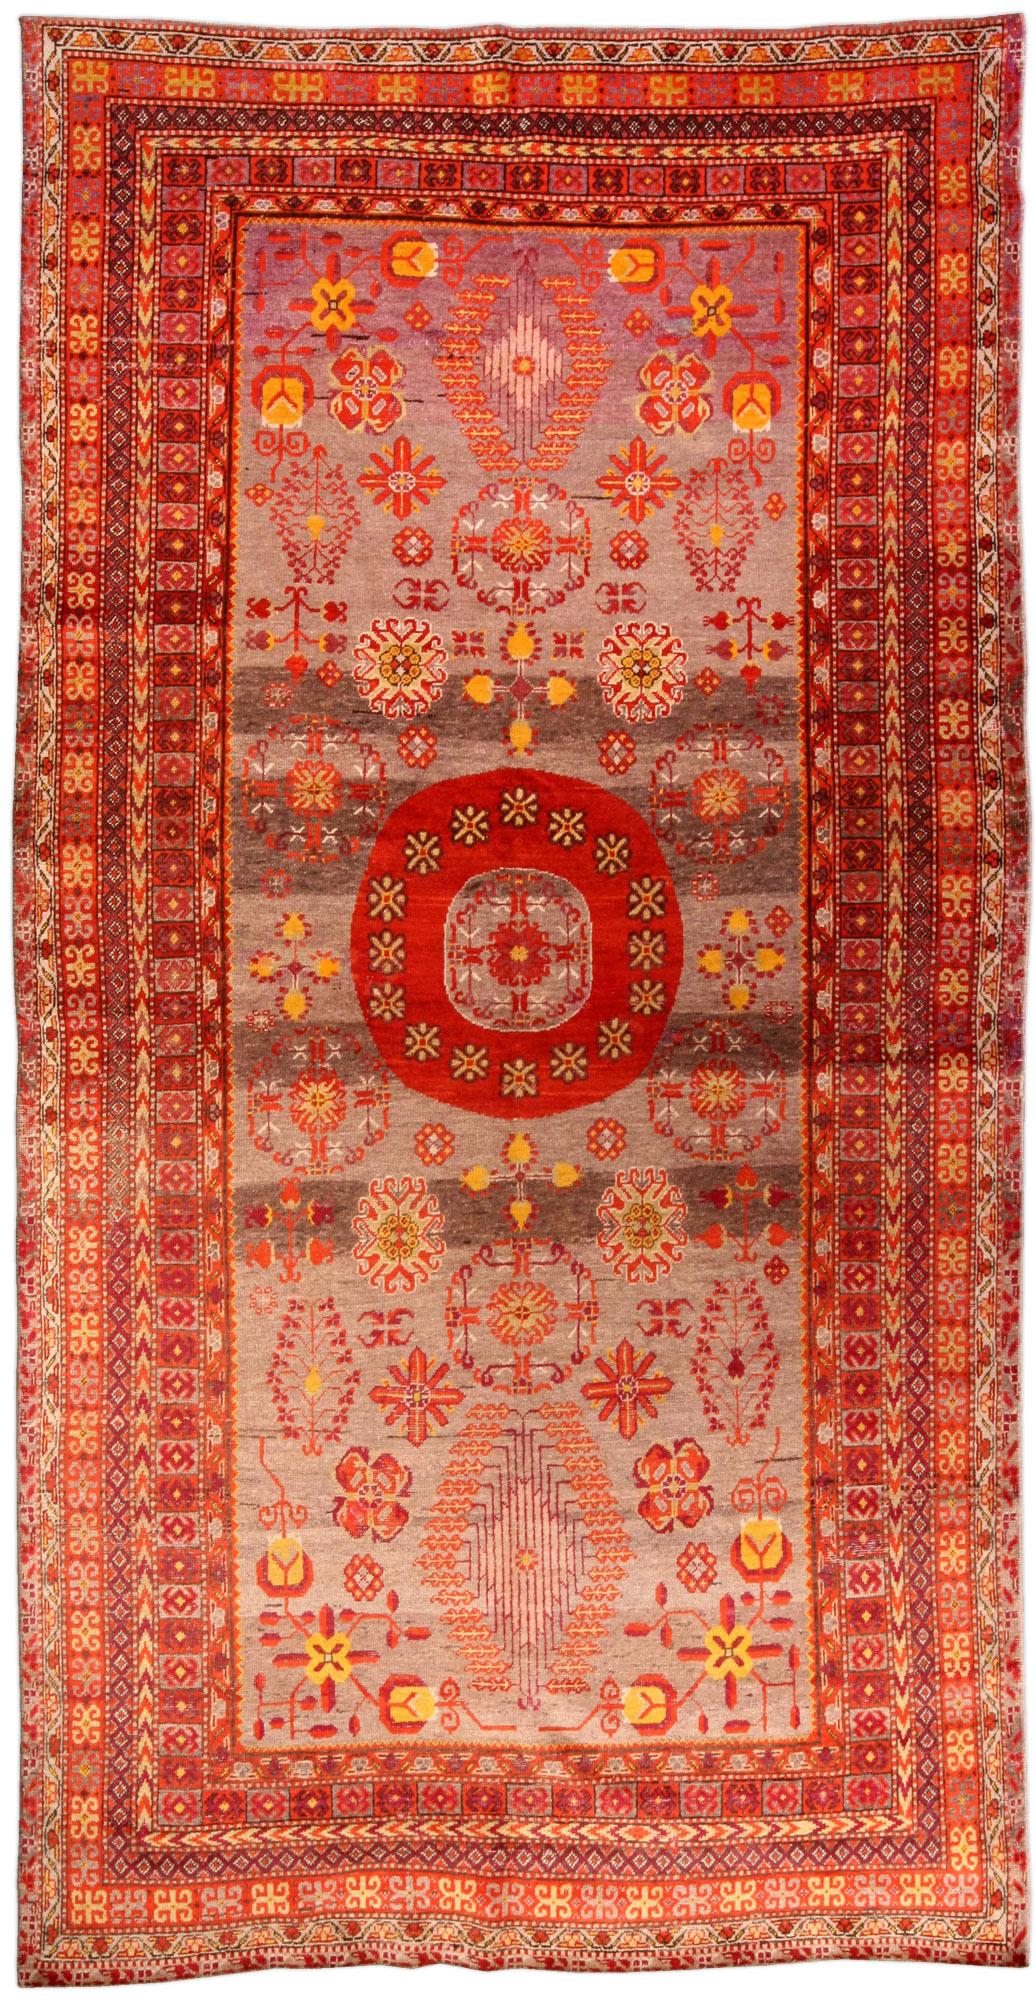 vintage-carpet-chinese-samarkand-khotan-red-geometric-bb4629-12x6